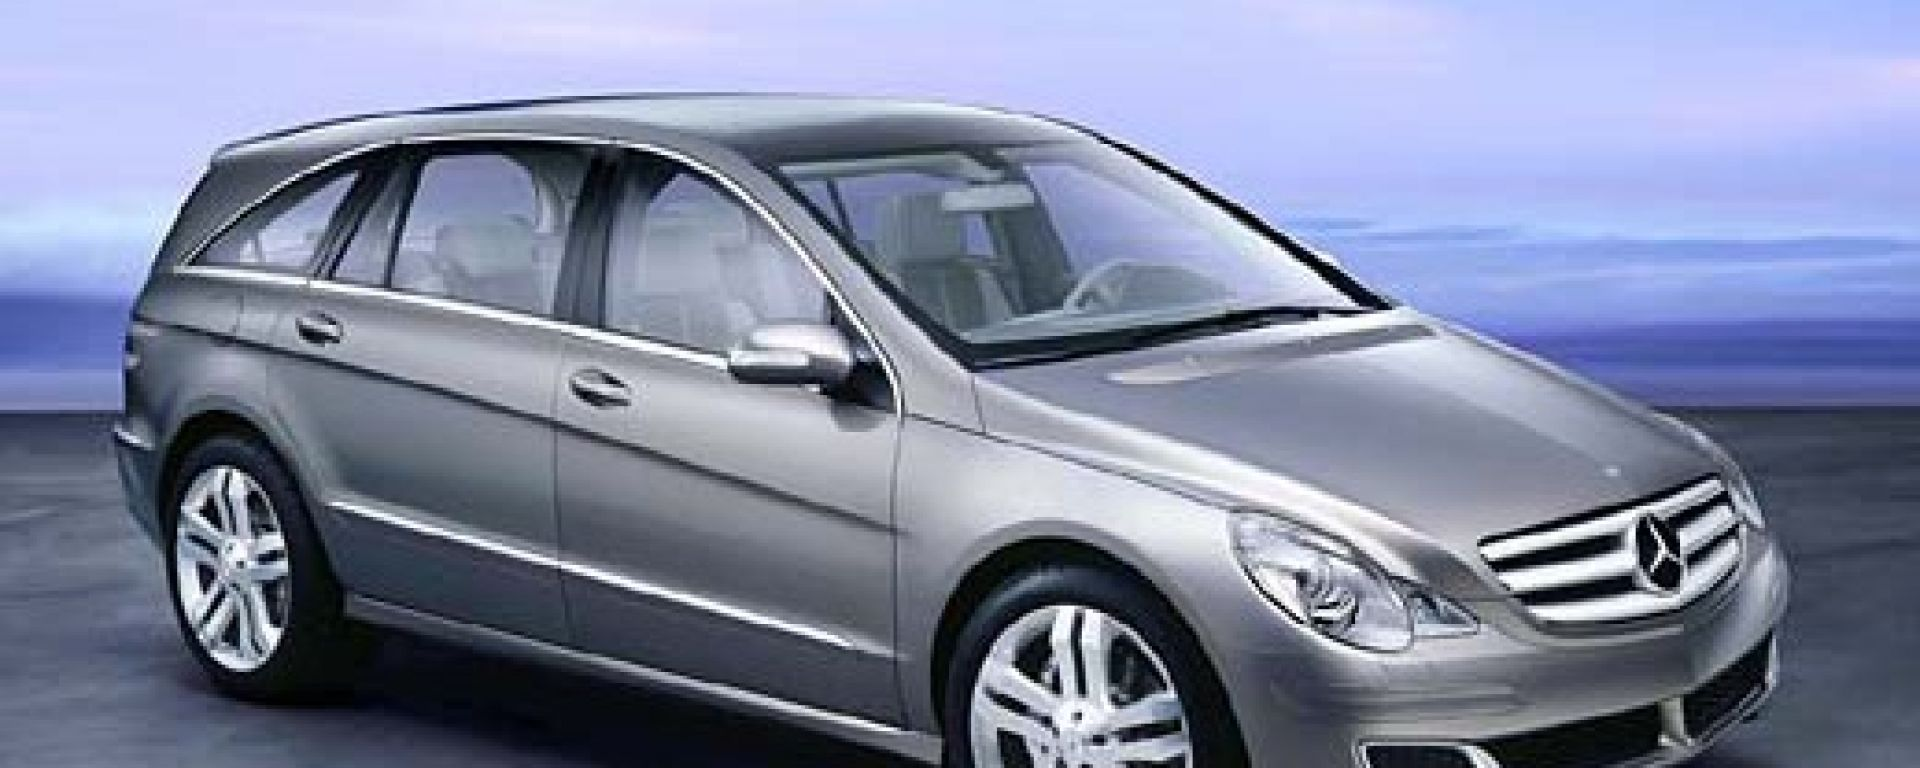 Anteprima: Mercedes Vision GST